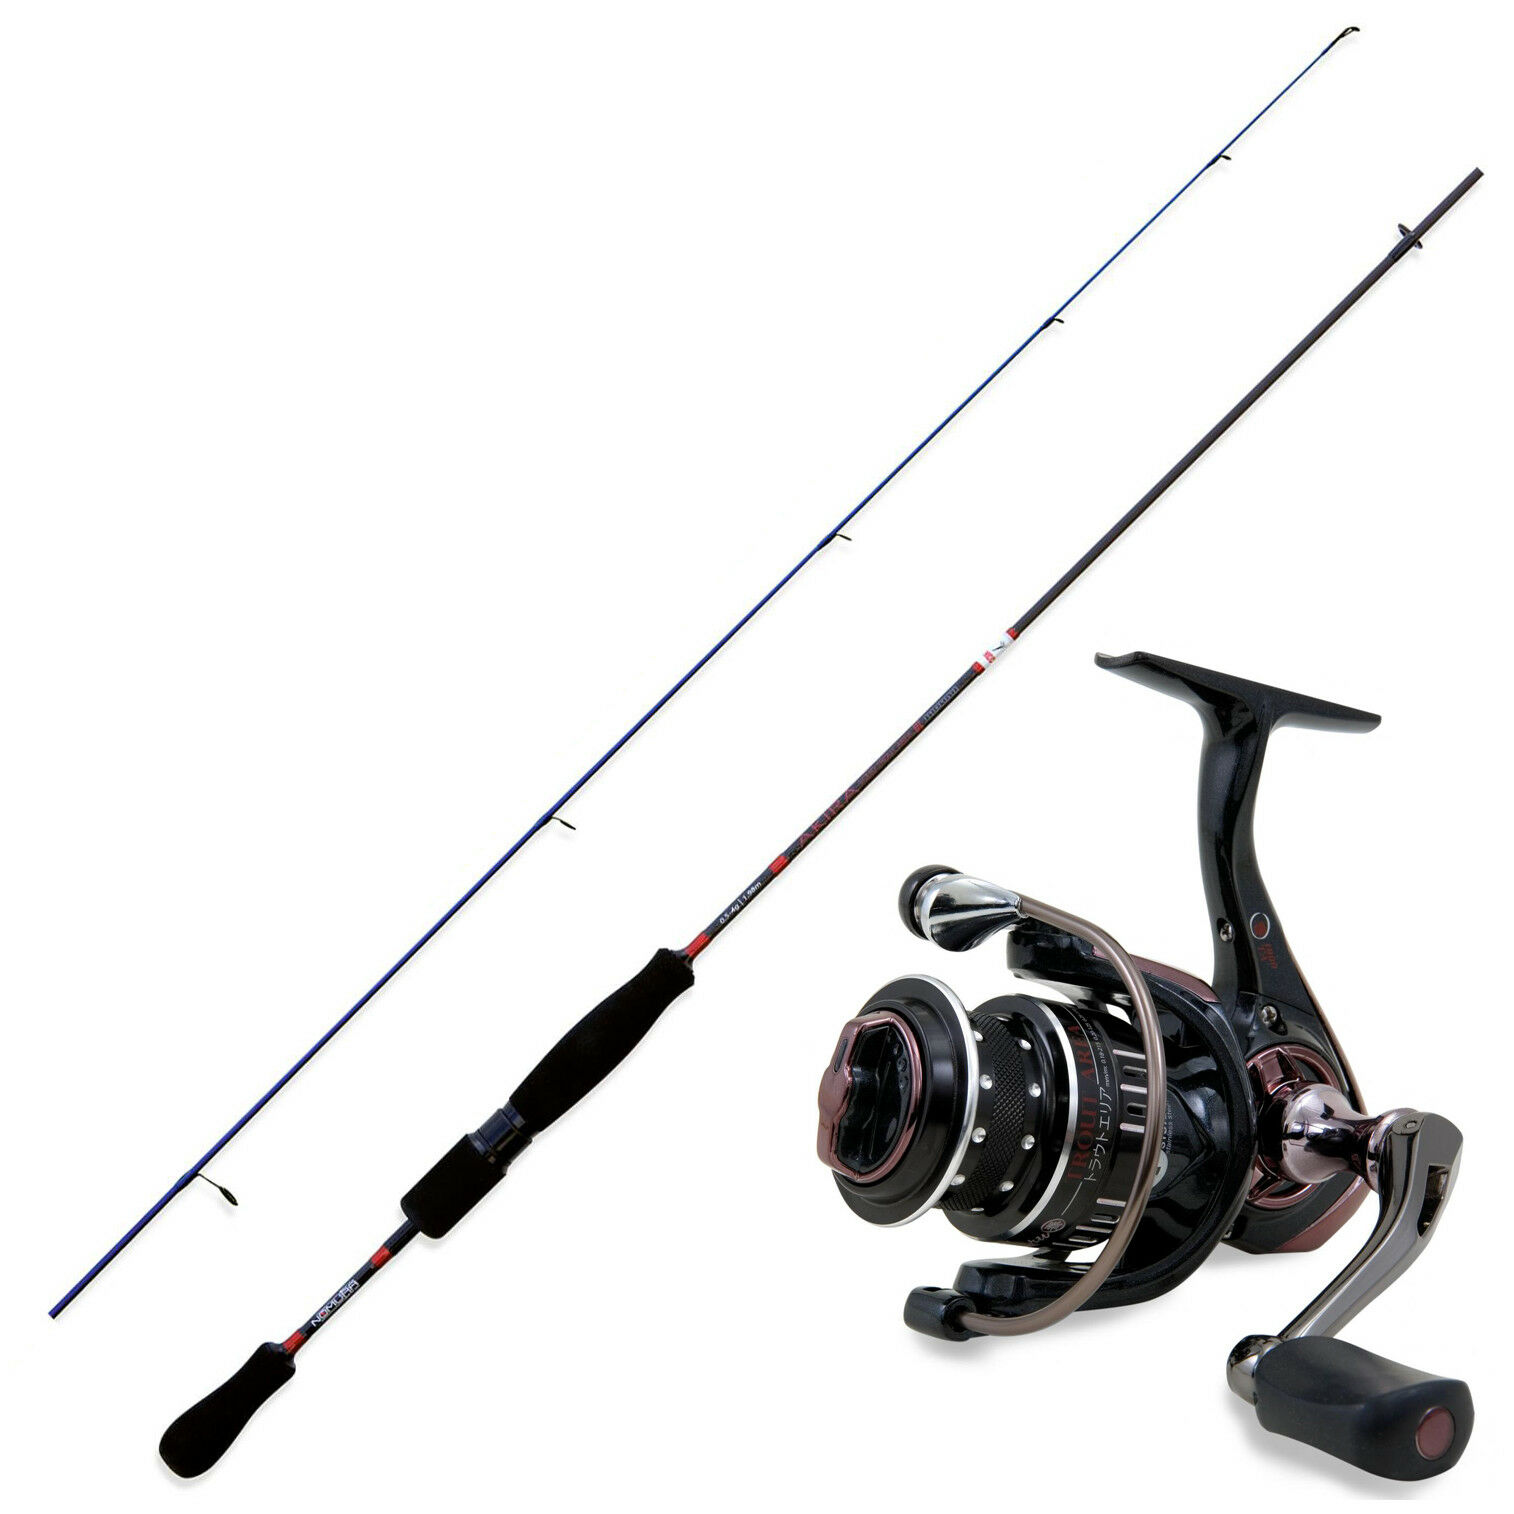 KP3574 Kit Pesca Trout Area Nomura Canna Akira Solid 1,70 m + Mulinello Har RNG